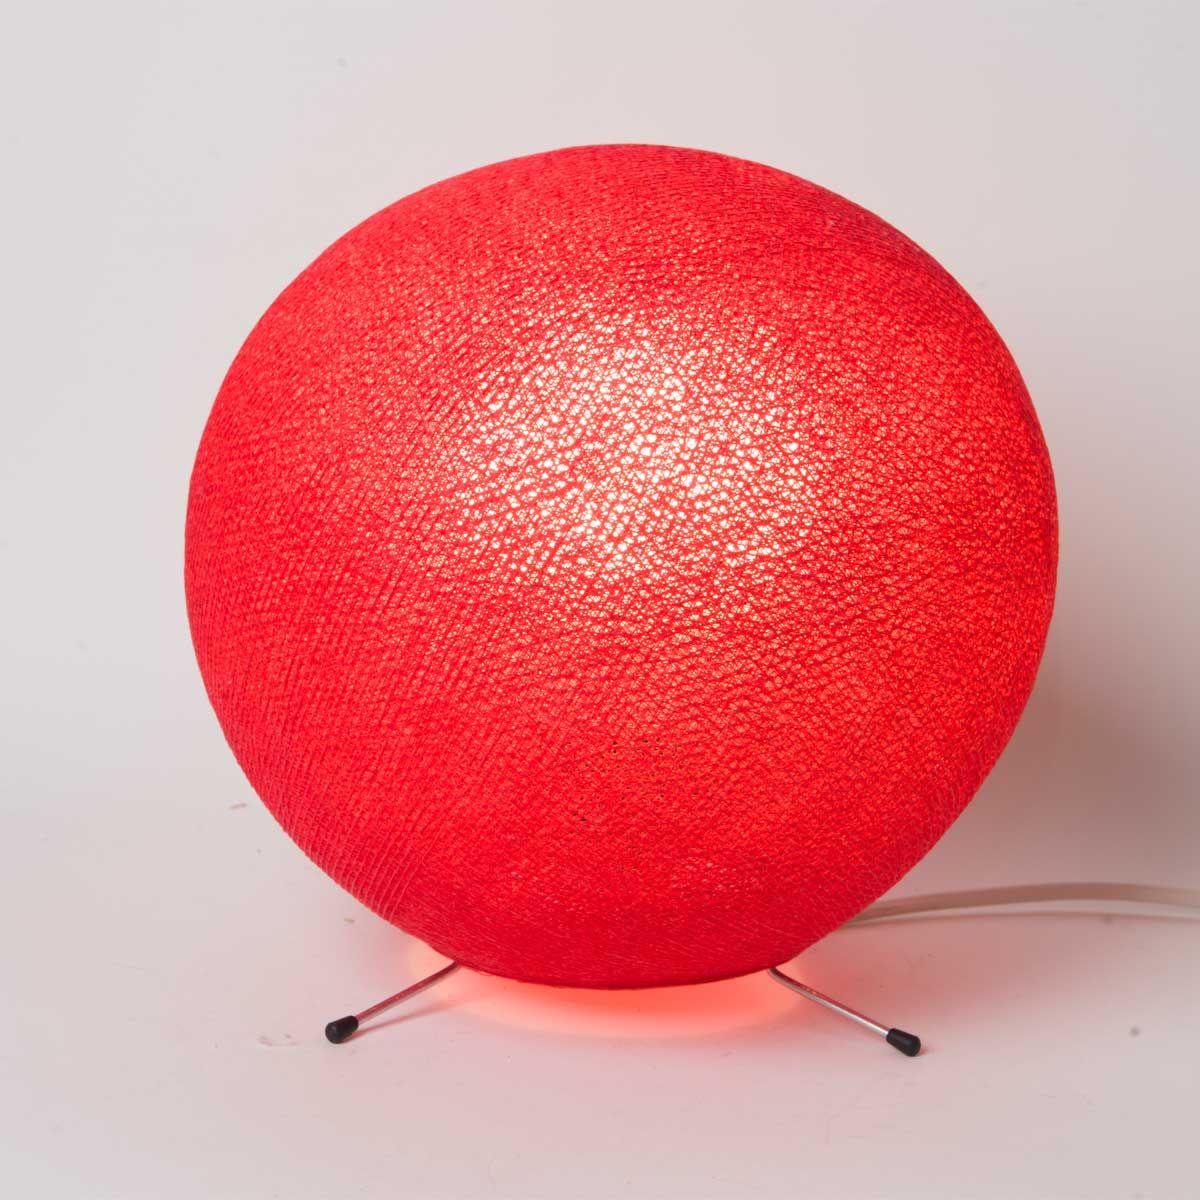 1000 images about big balls on pinterest - Luminaire Boules Colores